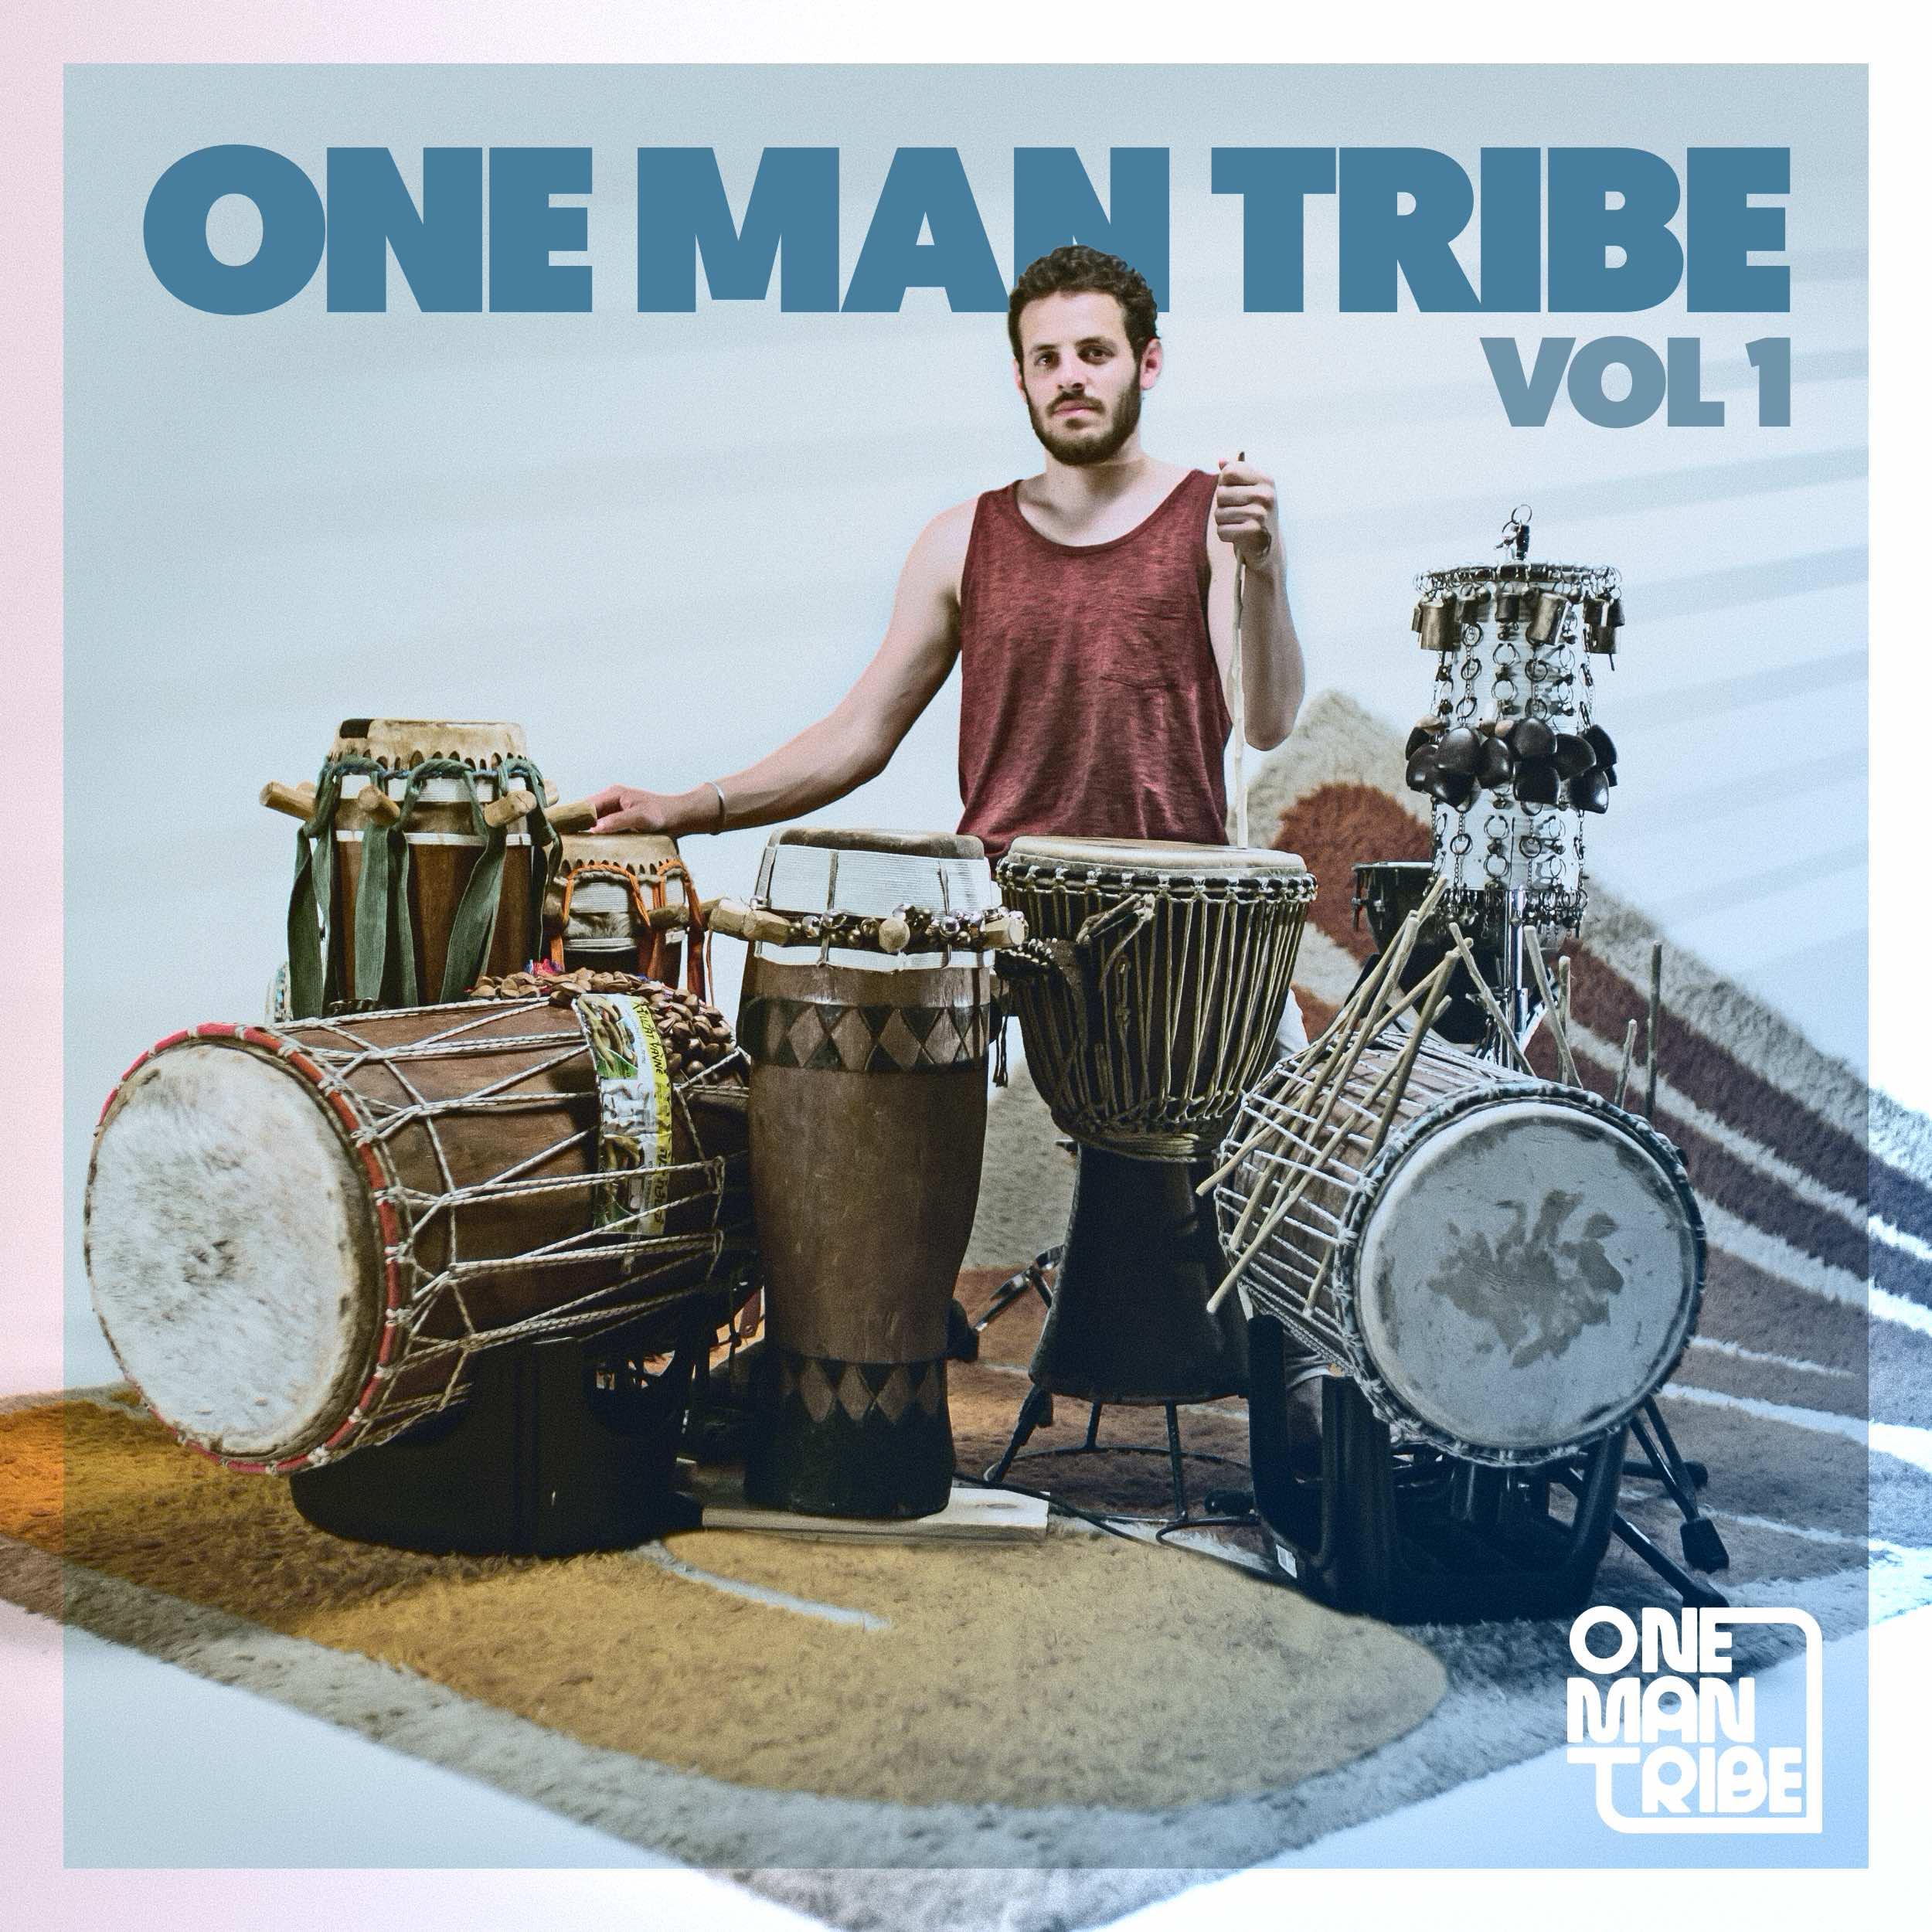 One Man Tribe Vol. 1